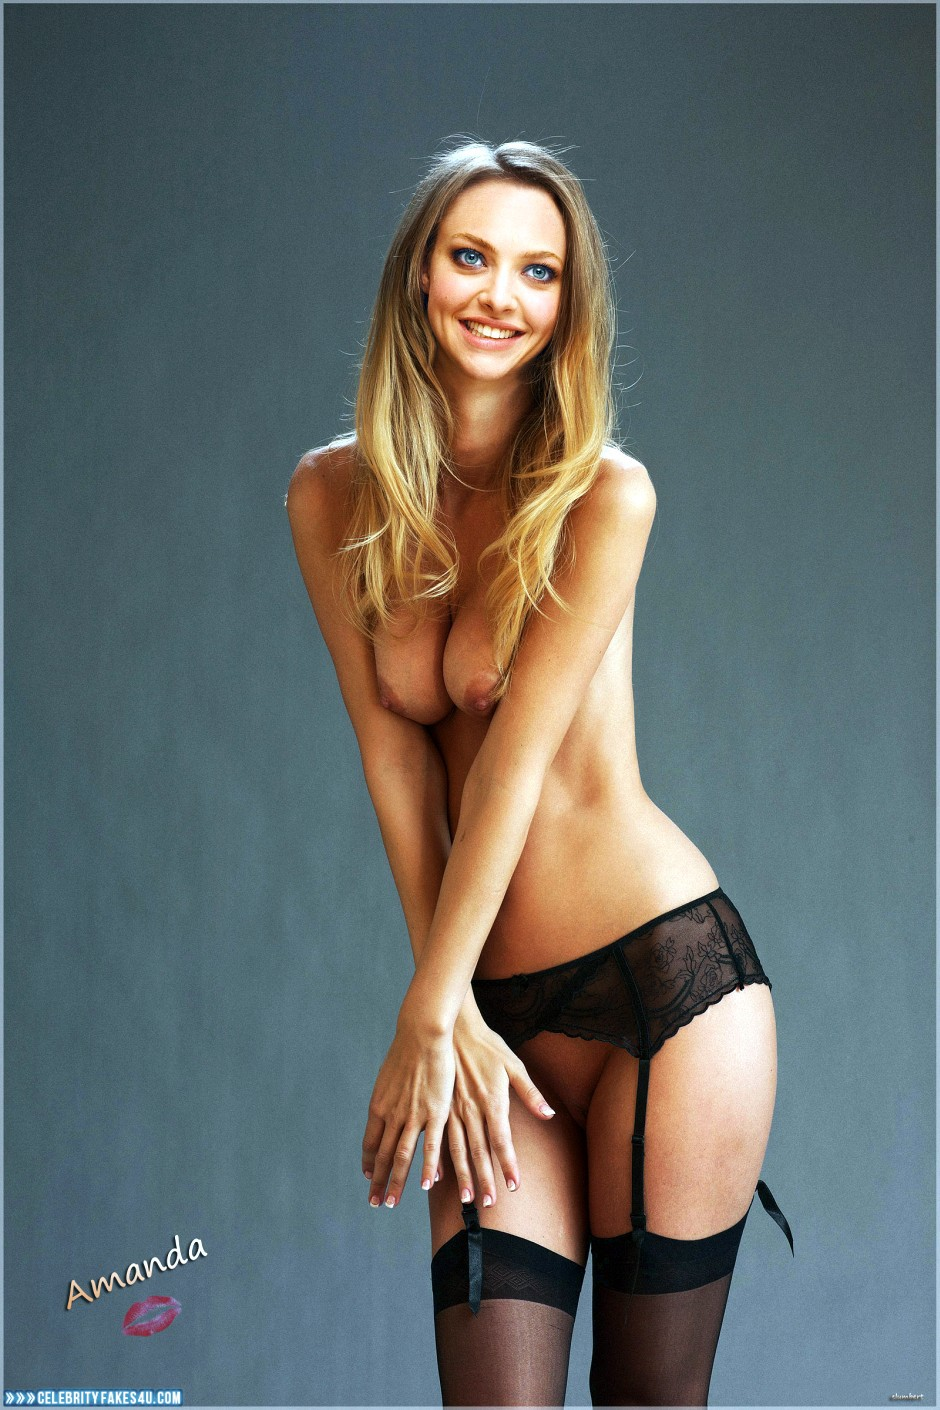 Amanda Seyfried Tits amanda seyfried stockings breasts porn fake 001 « celebrity